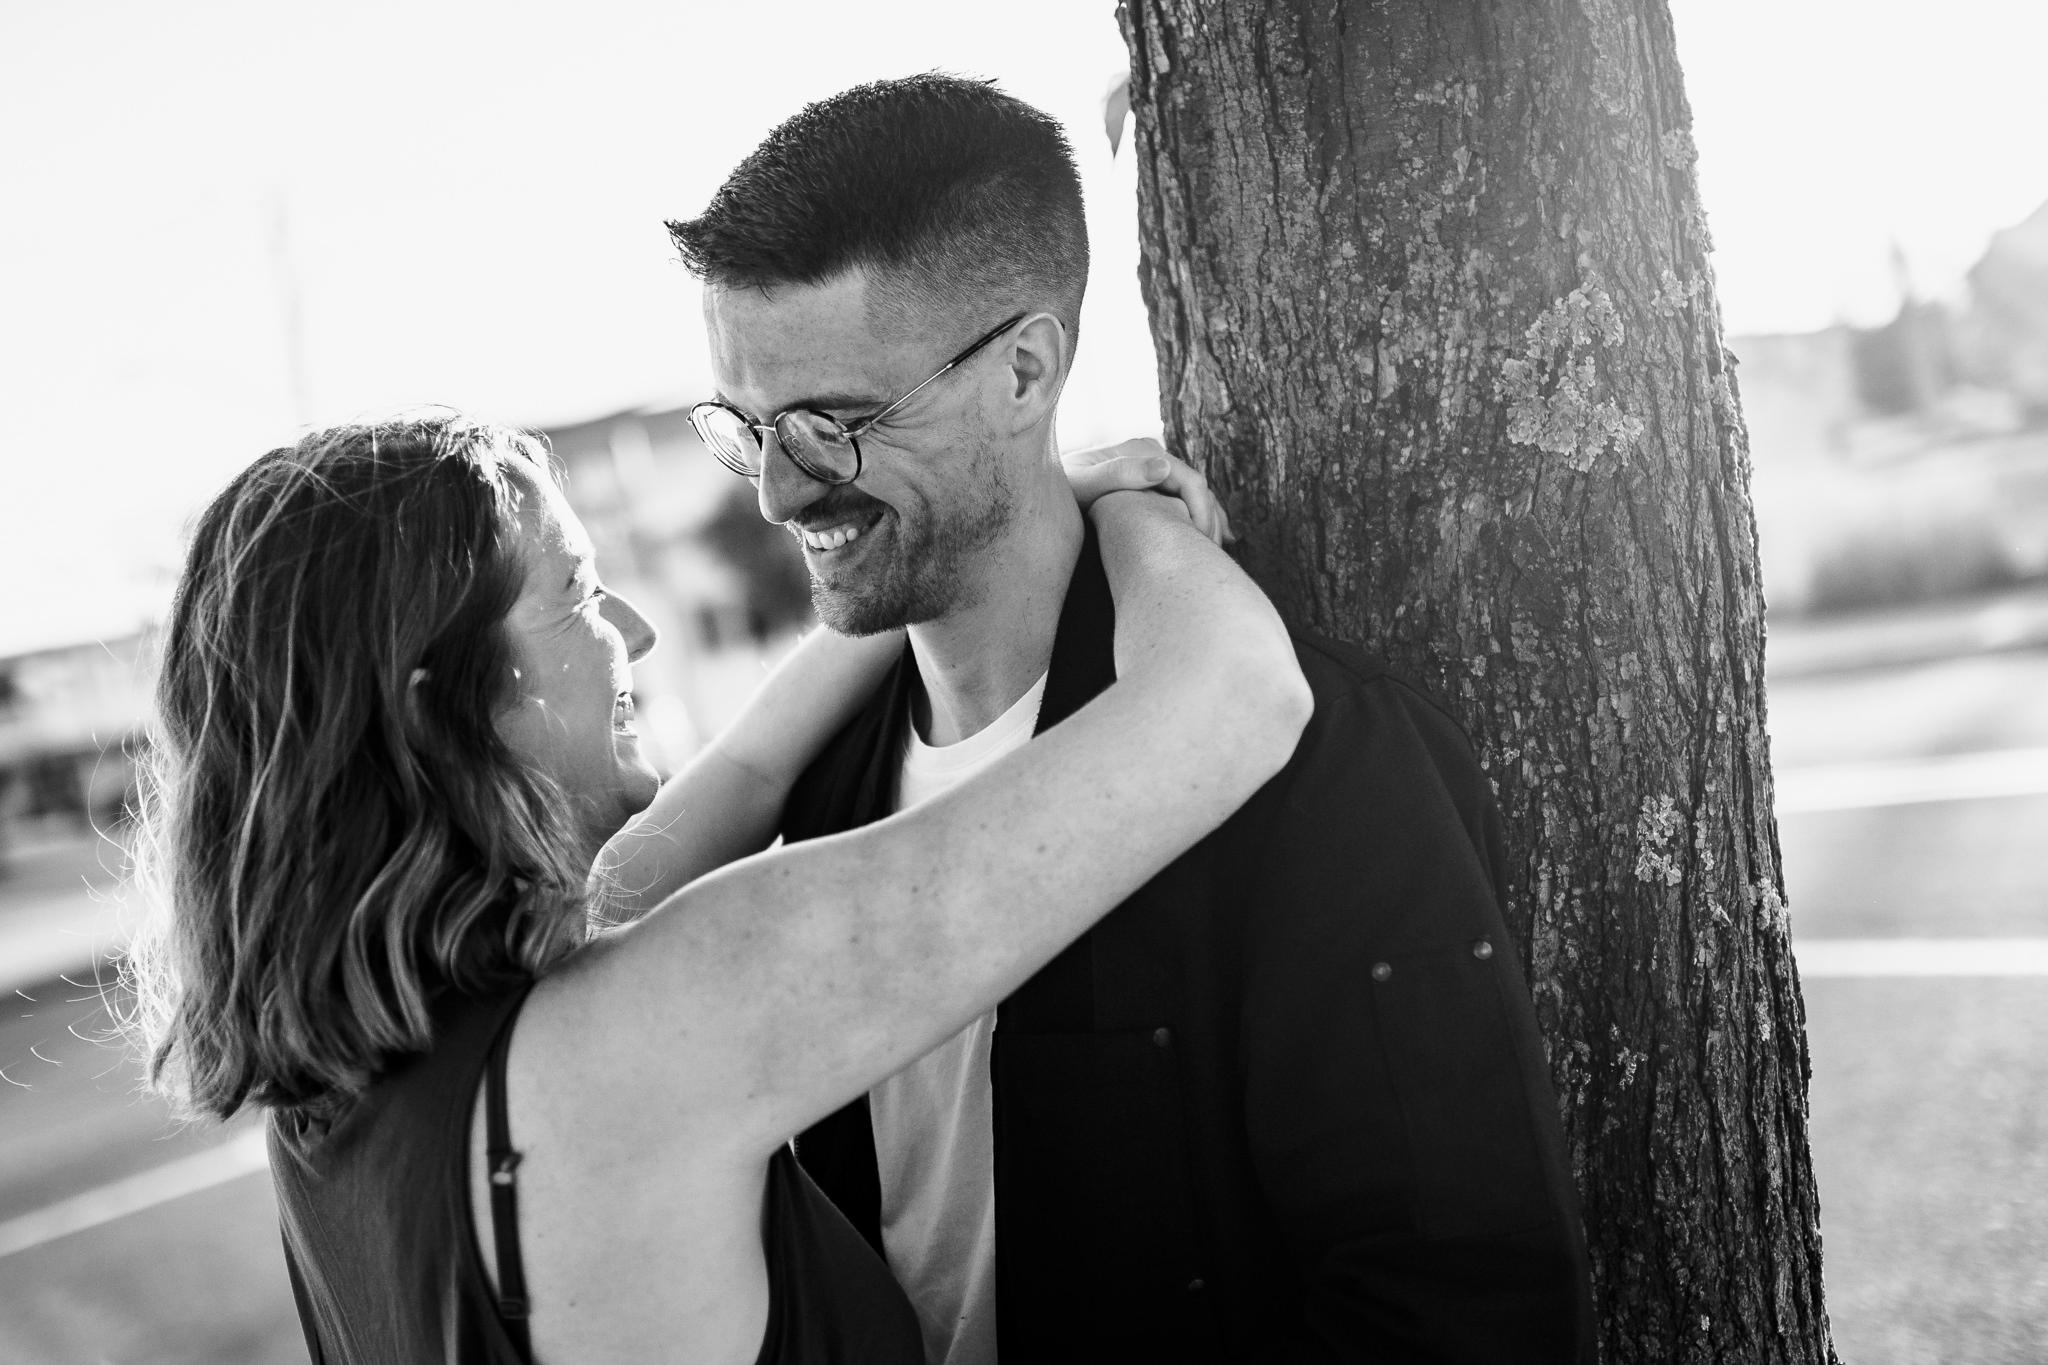 Robbins-Wildwood-Cape-May-Engagement-Photos-NJ-Photographer-10.JPG